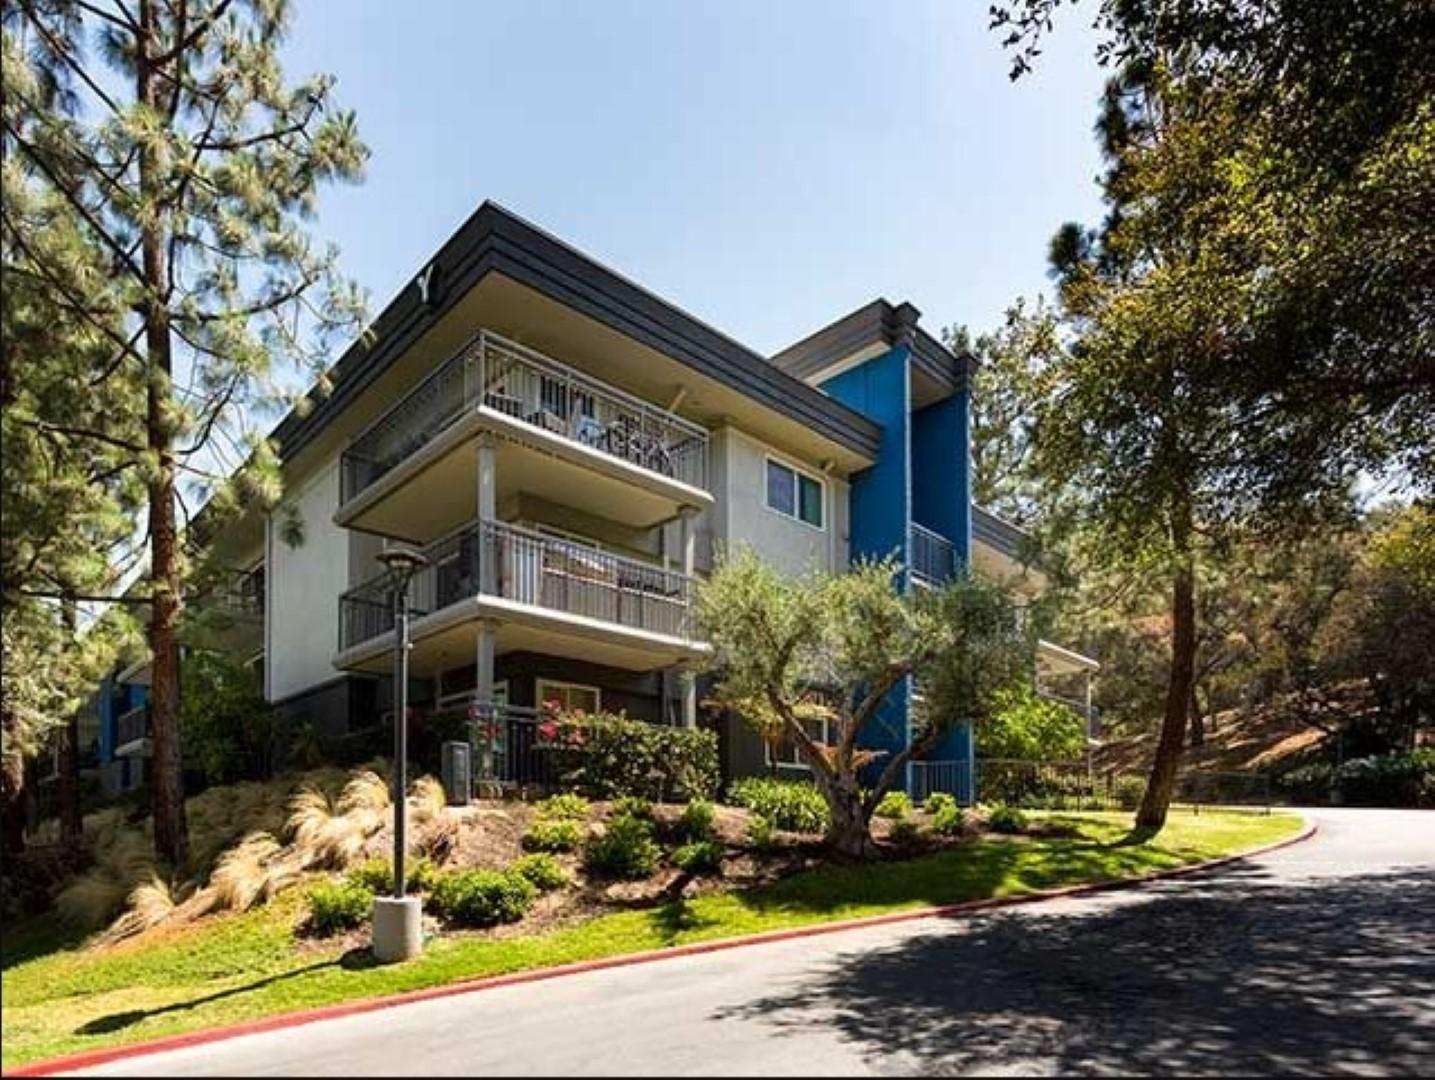 Exterior at Ava Toluca Hills Apartments, Toluca Lake, Los Angeles